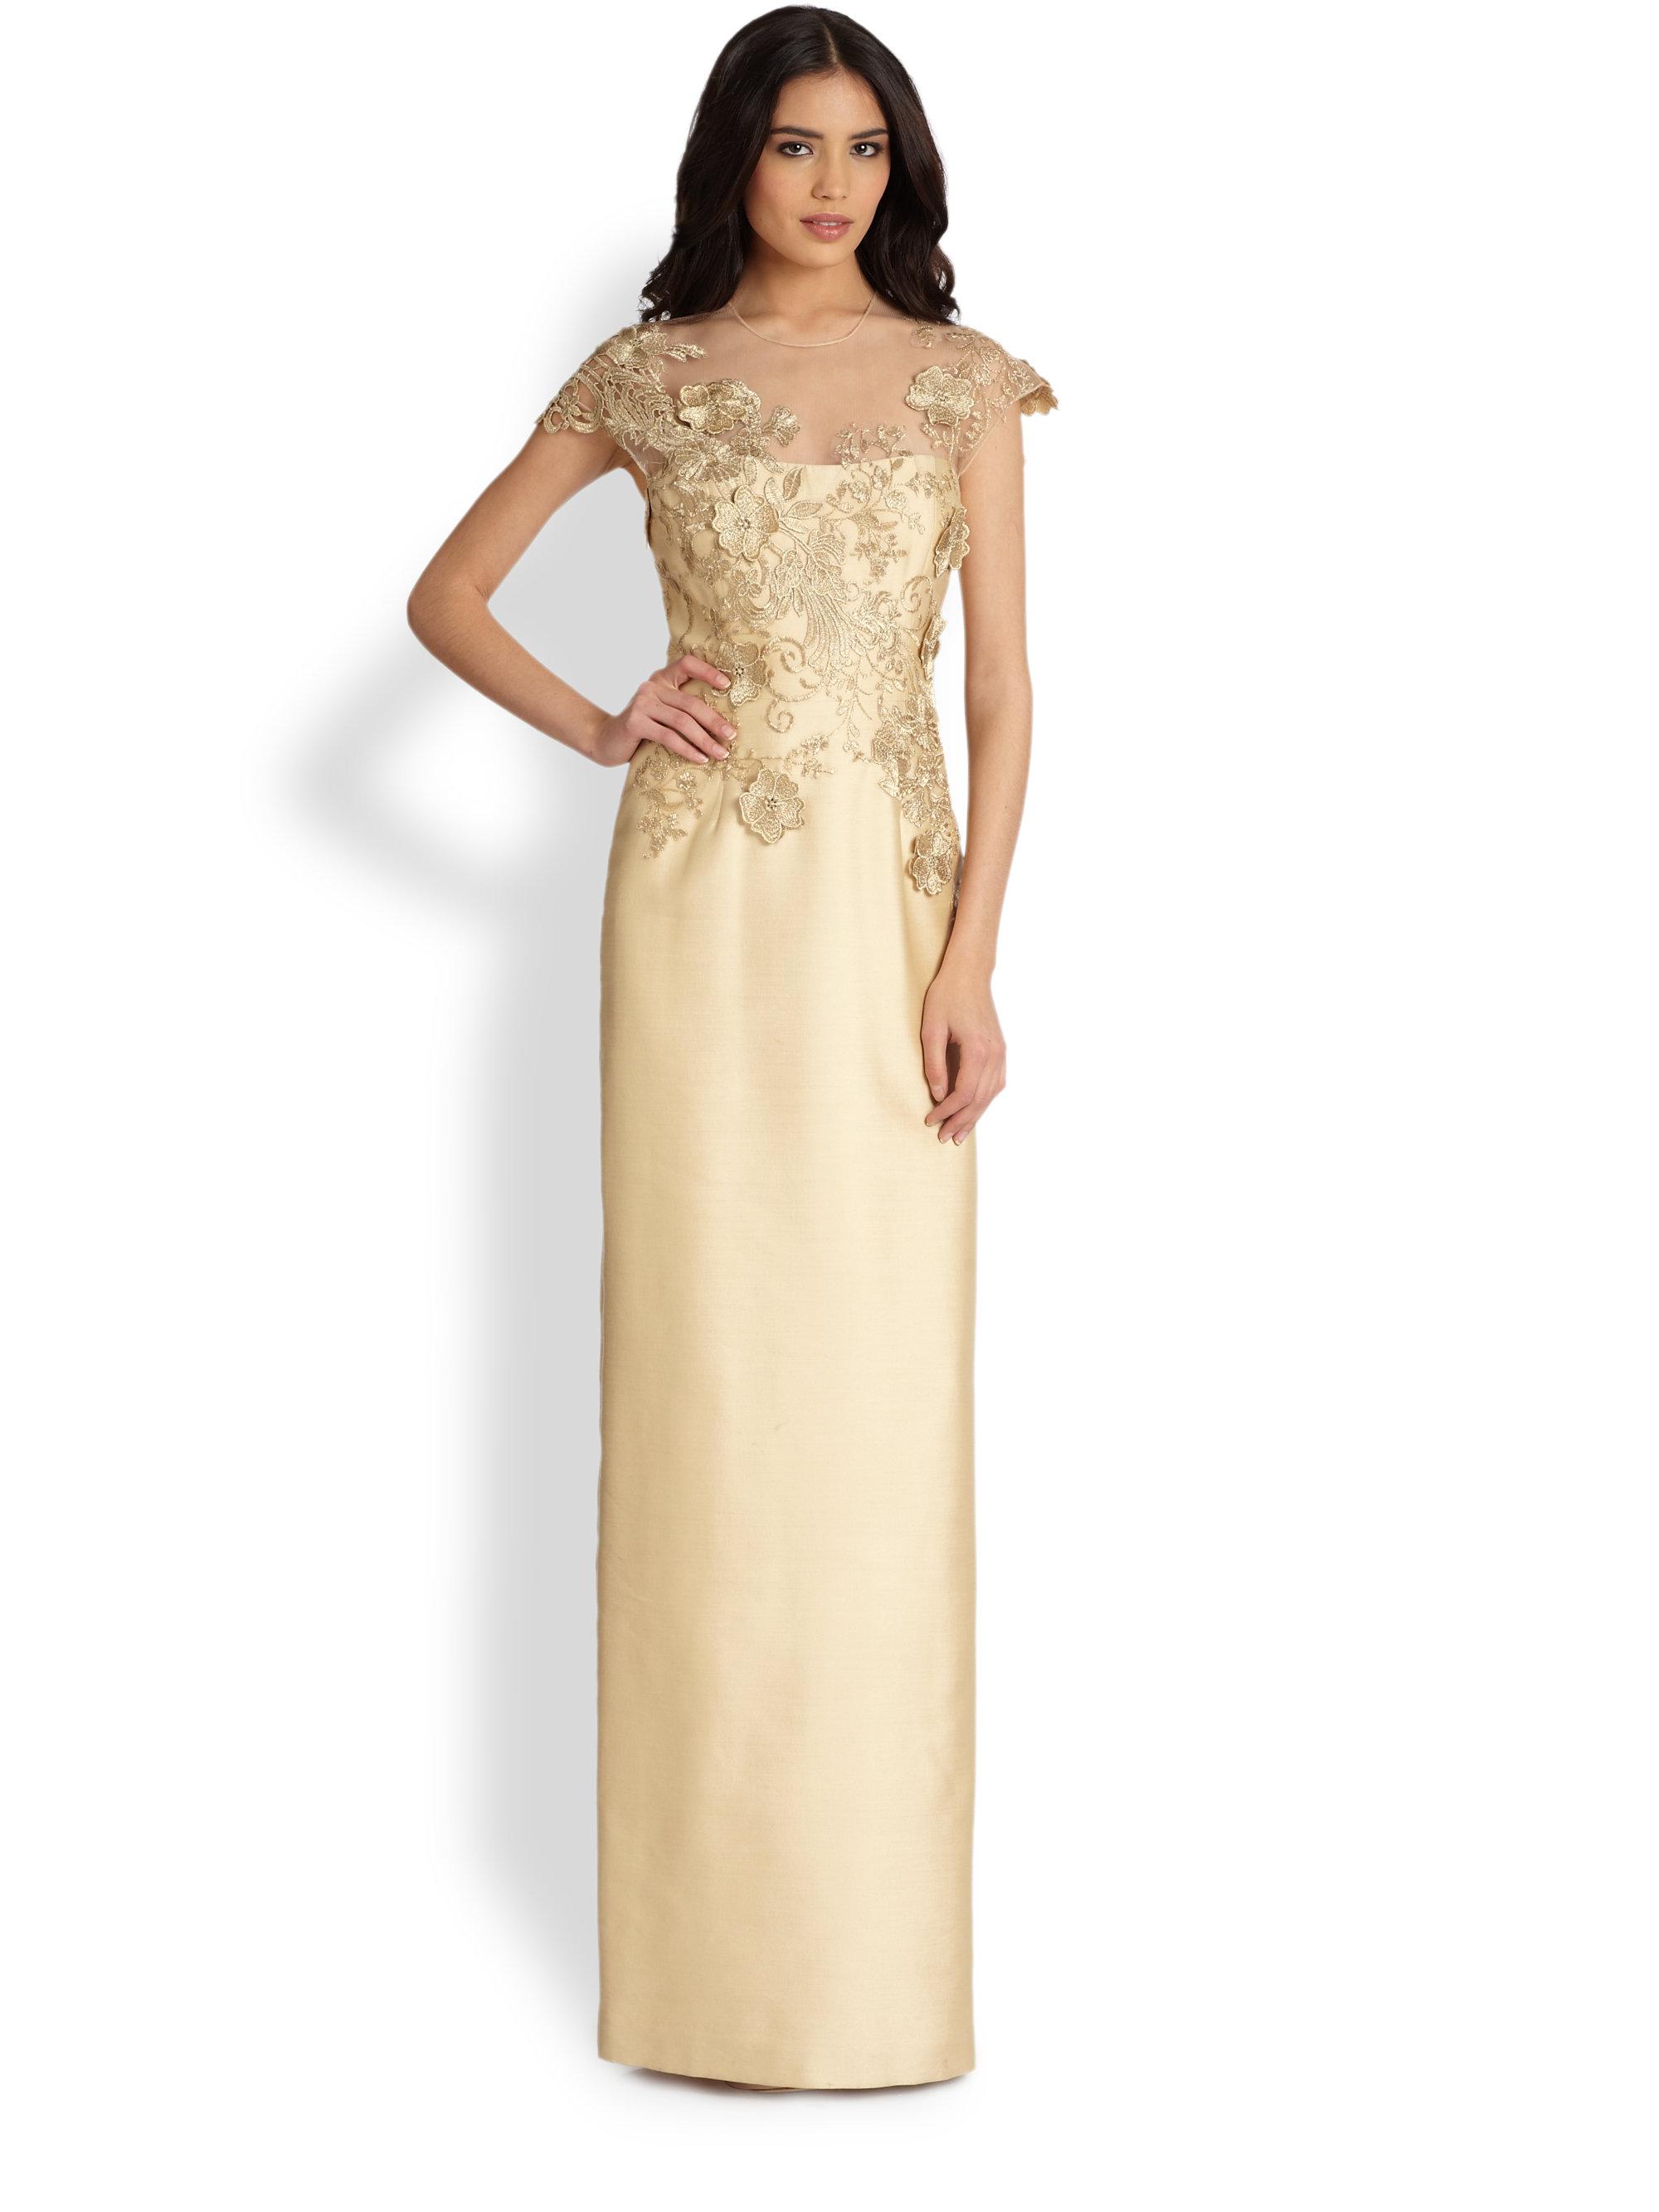 Lyst - Teri Jon Lace-applique Gown in Metallic